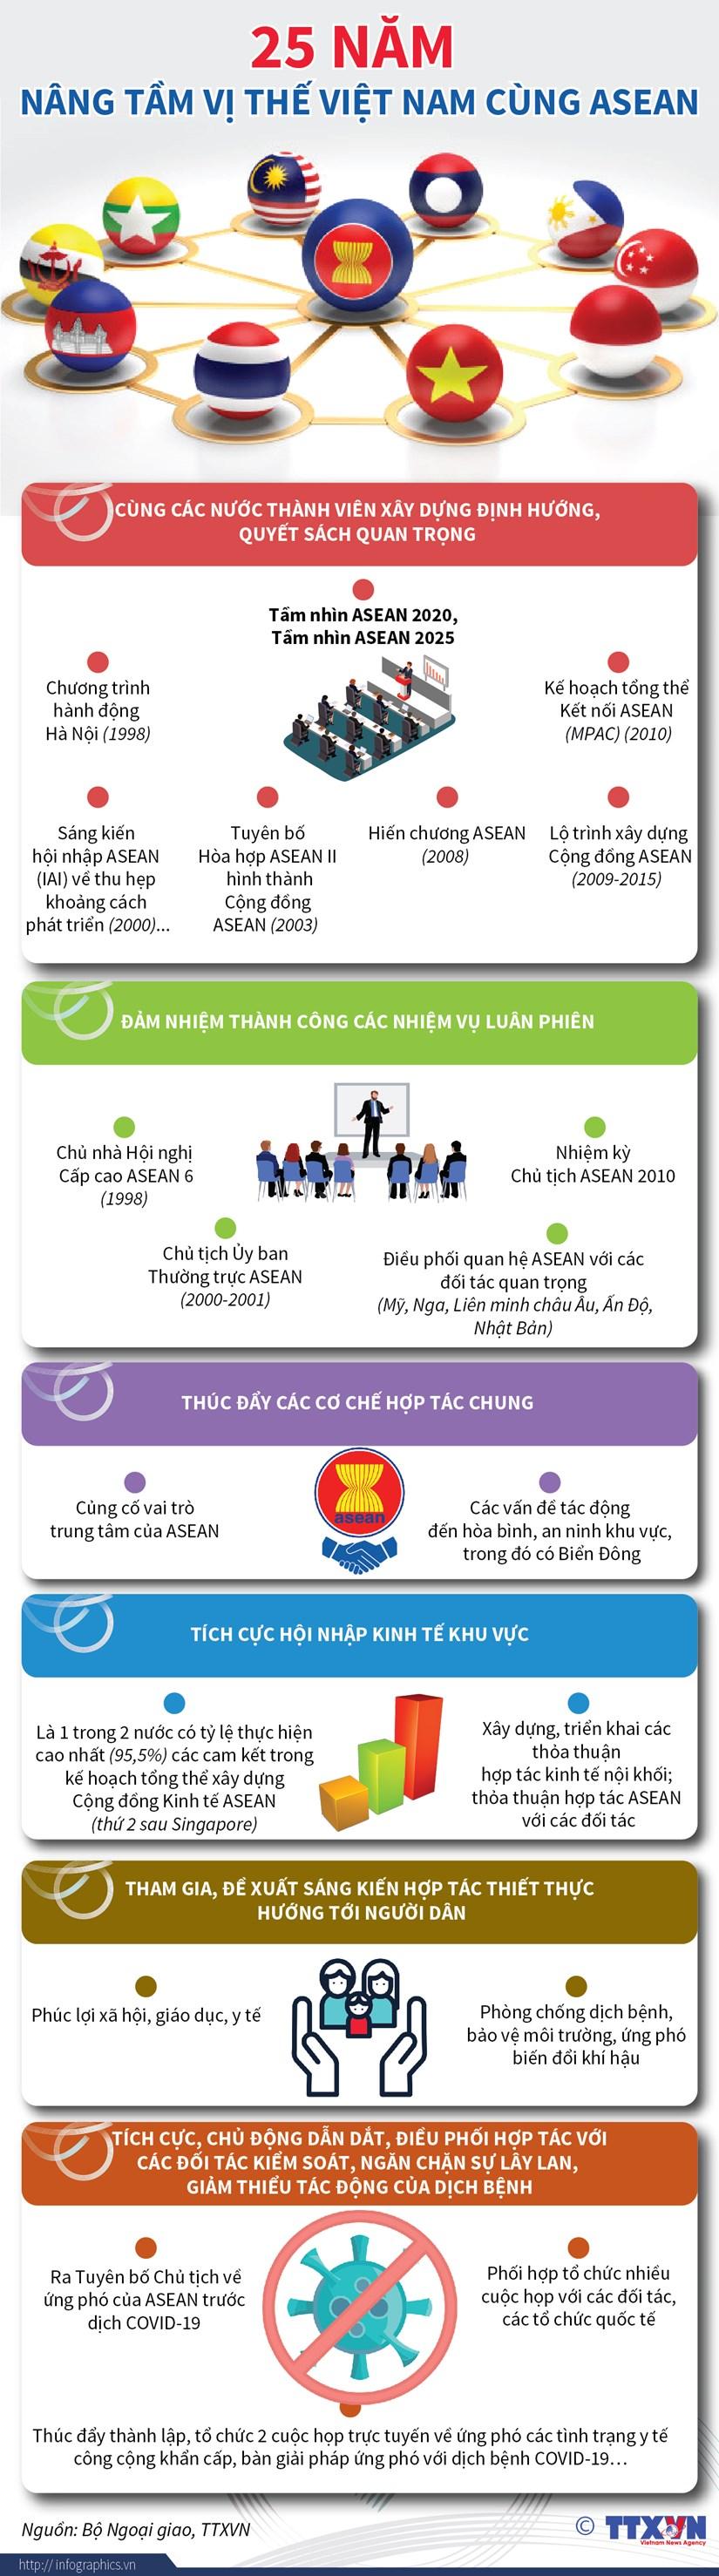 [Infographics] 25 nam nang tam vi the Viet Nam cung ASEAN hinh anh 1